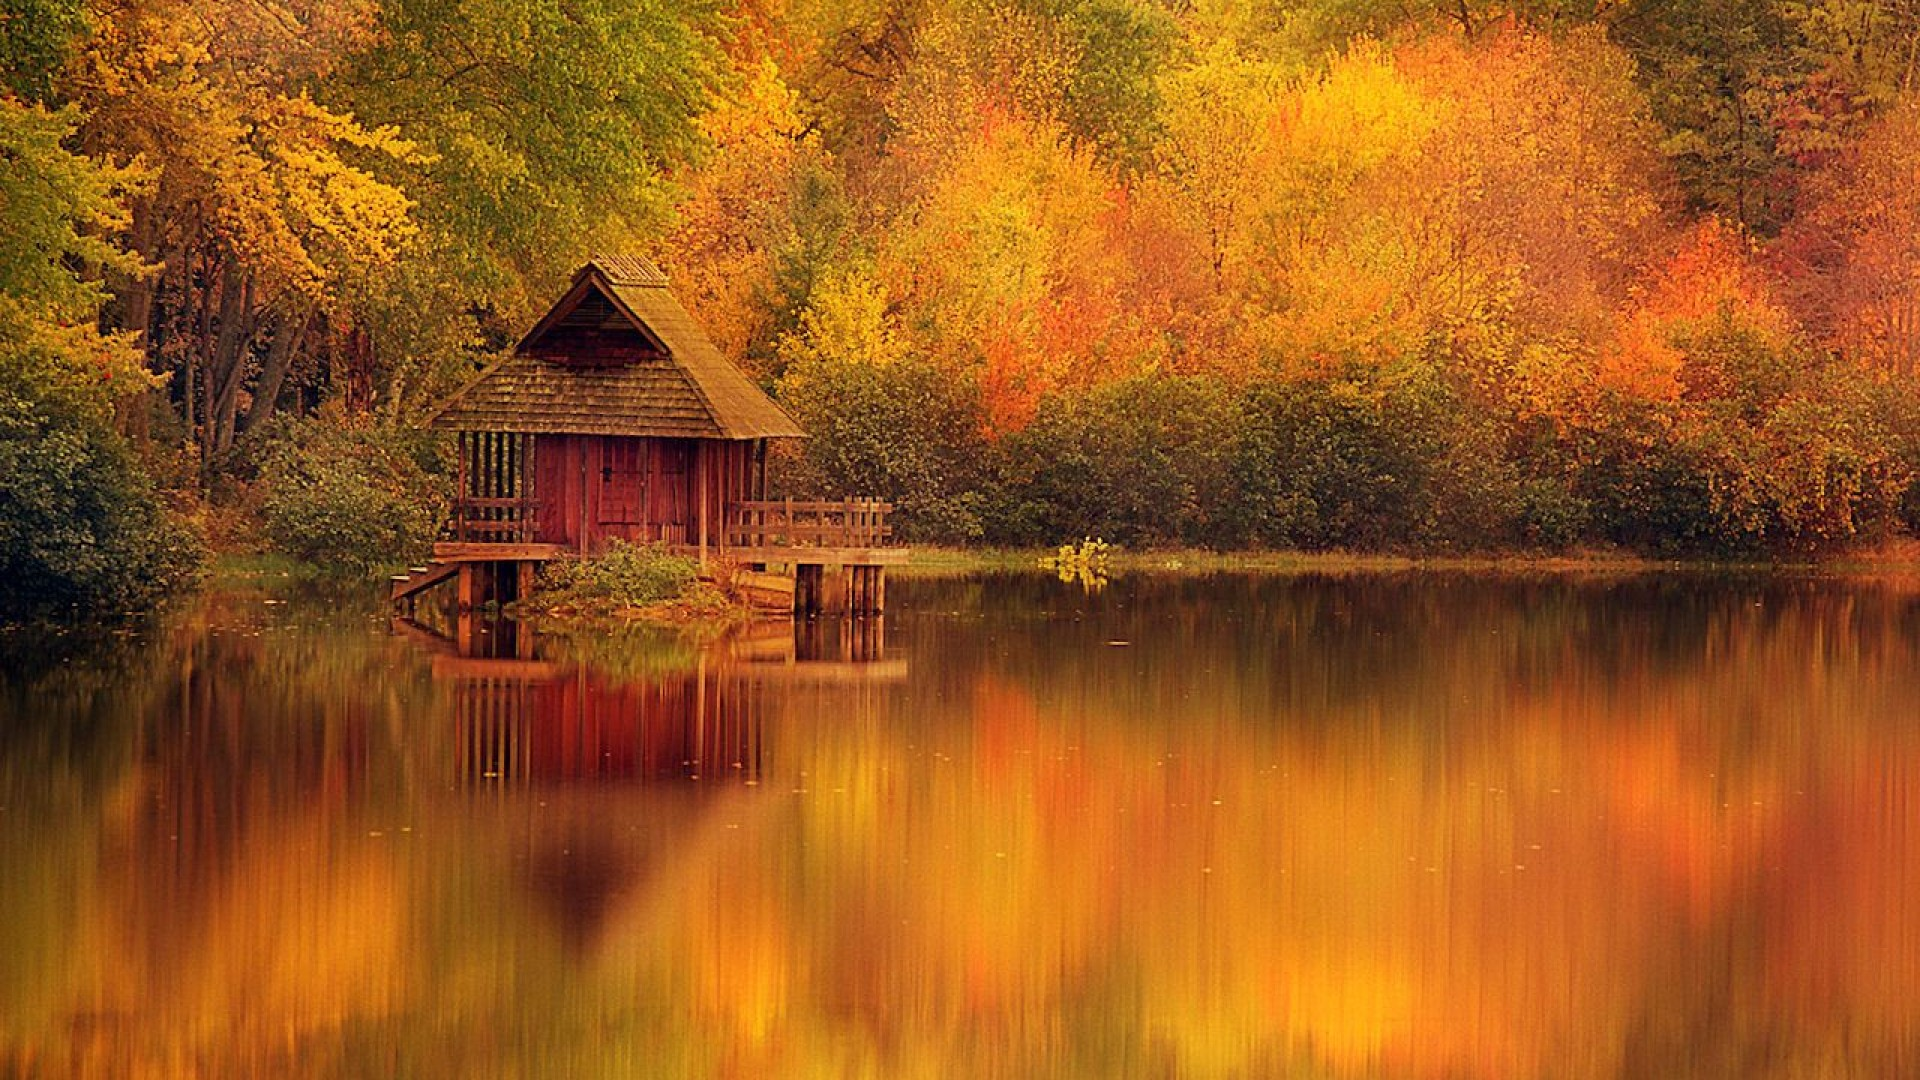 Fall Foliage Wallpaper For Computer Hd Log Cabin Wallpapers Pixelstalk Net